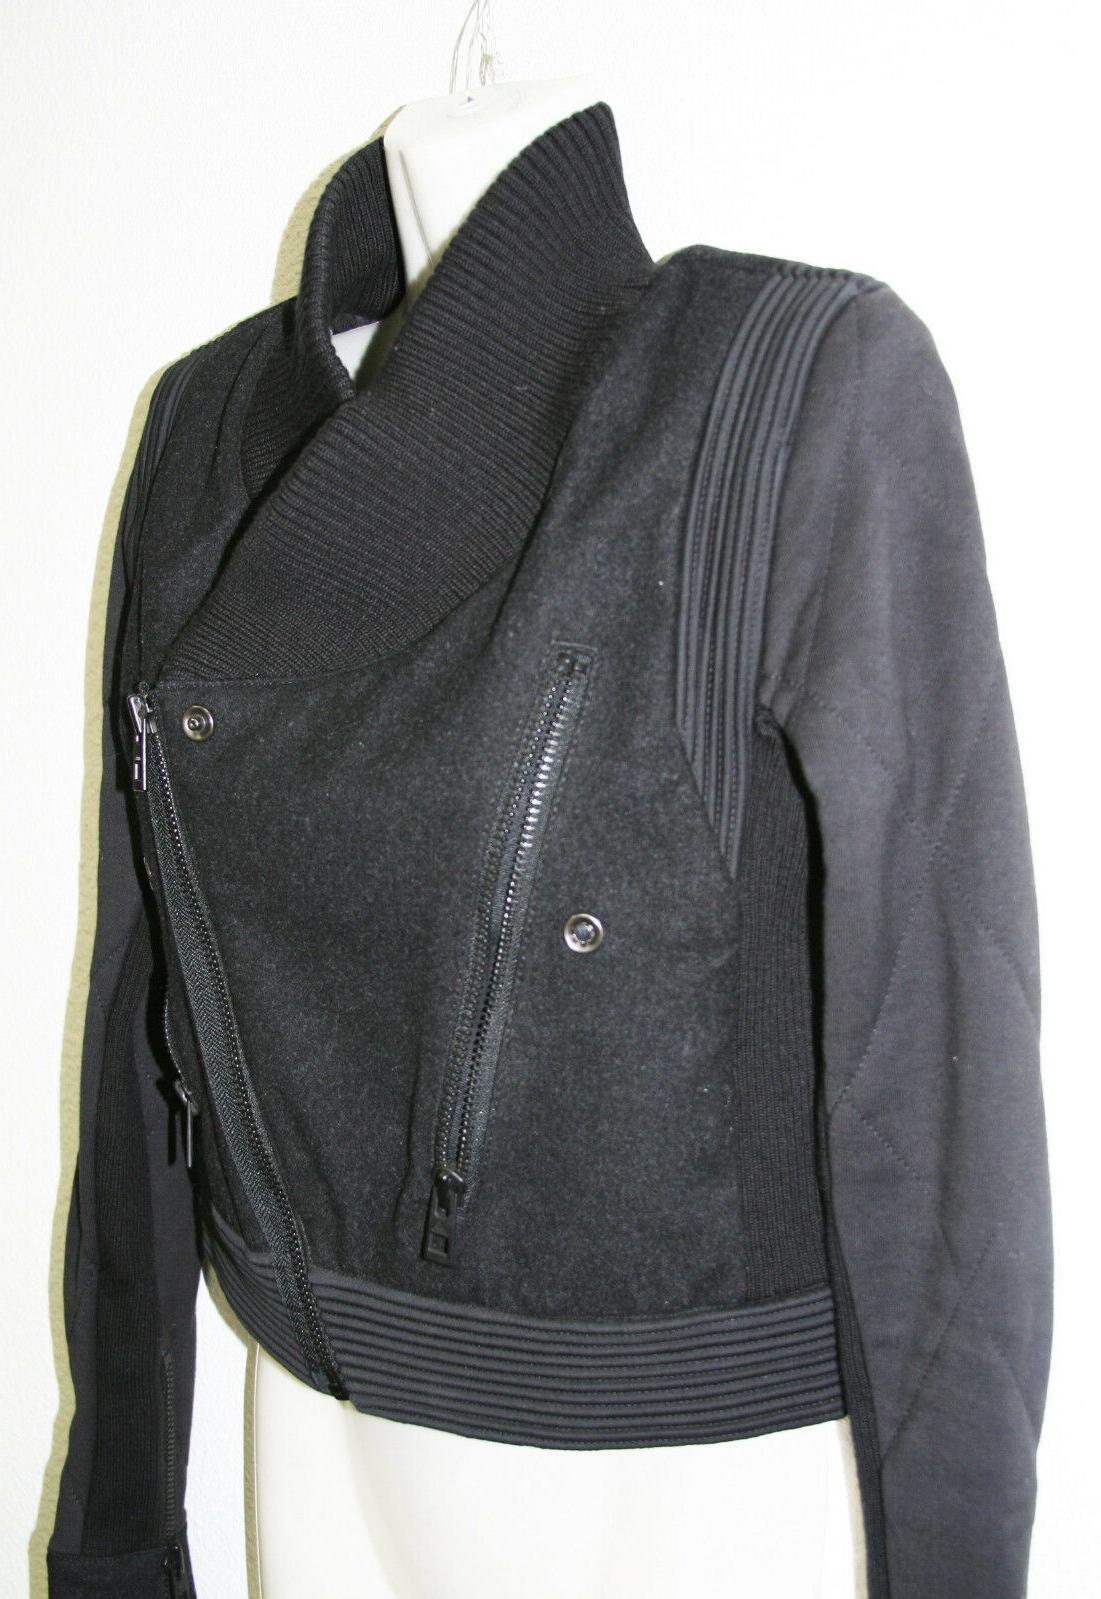 Womens Adidas x Mccartney Black Jacket